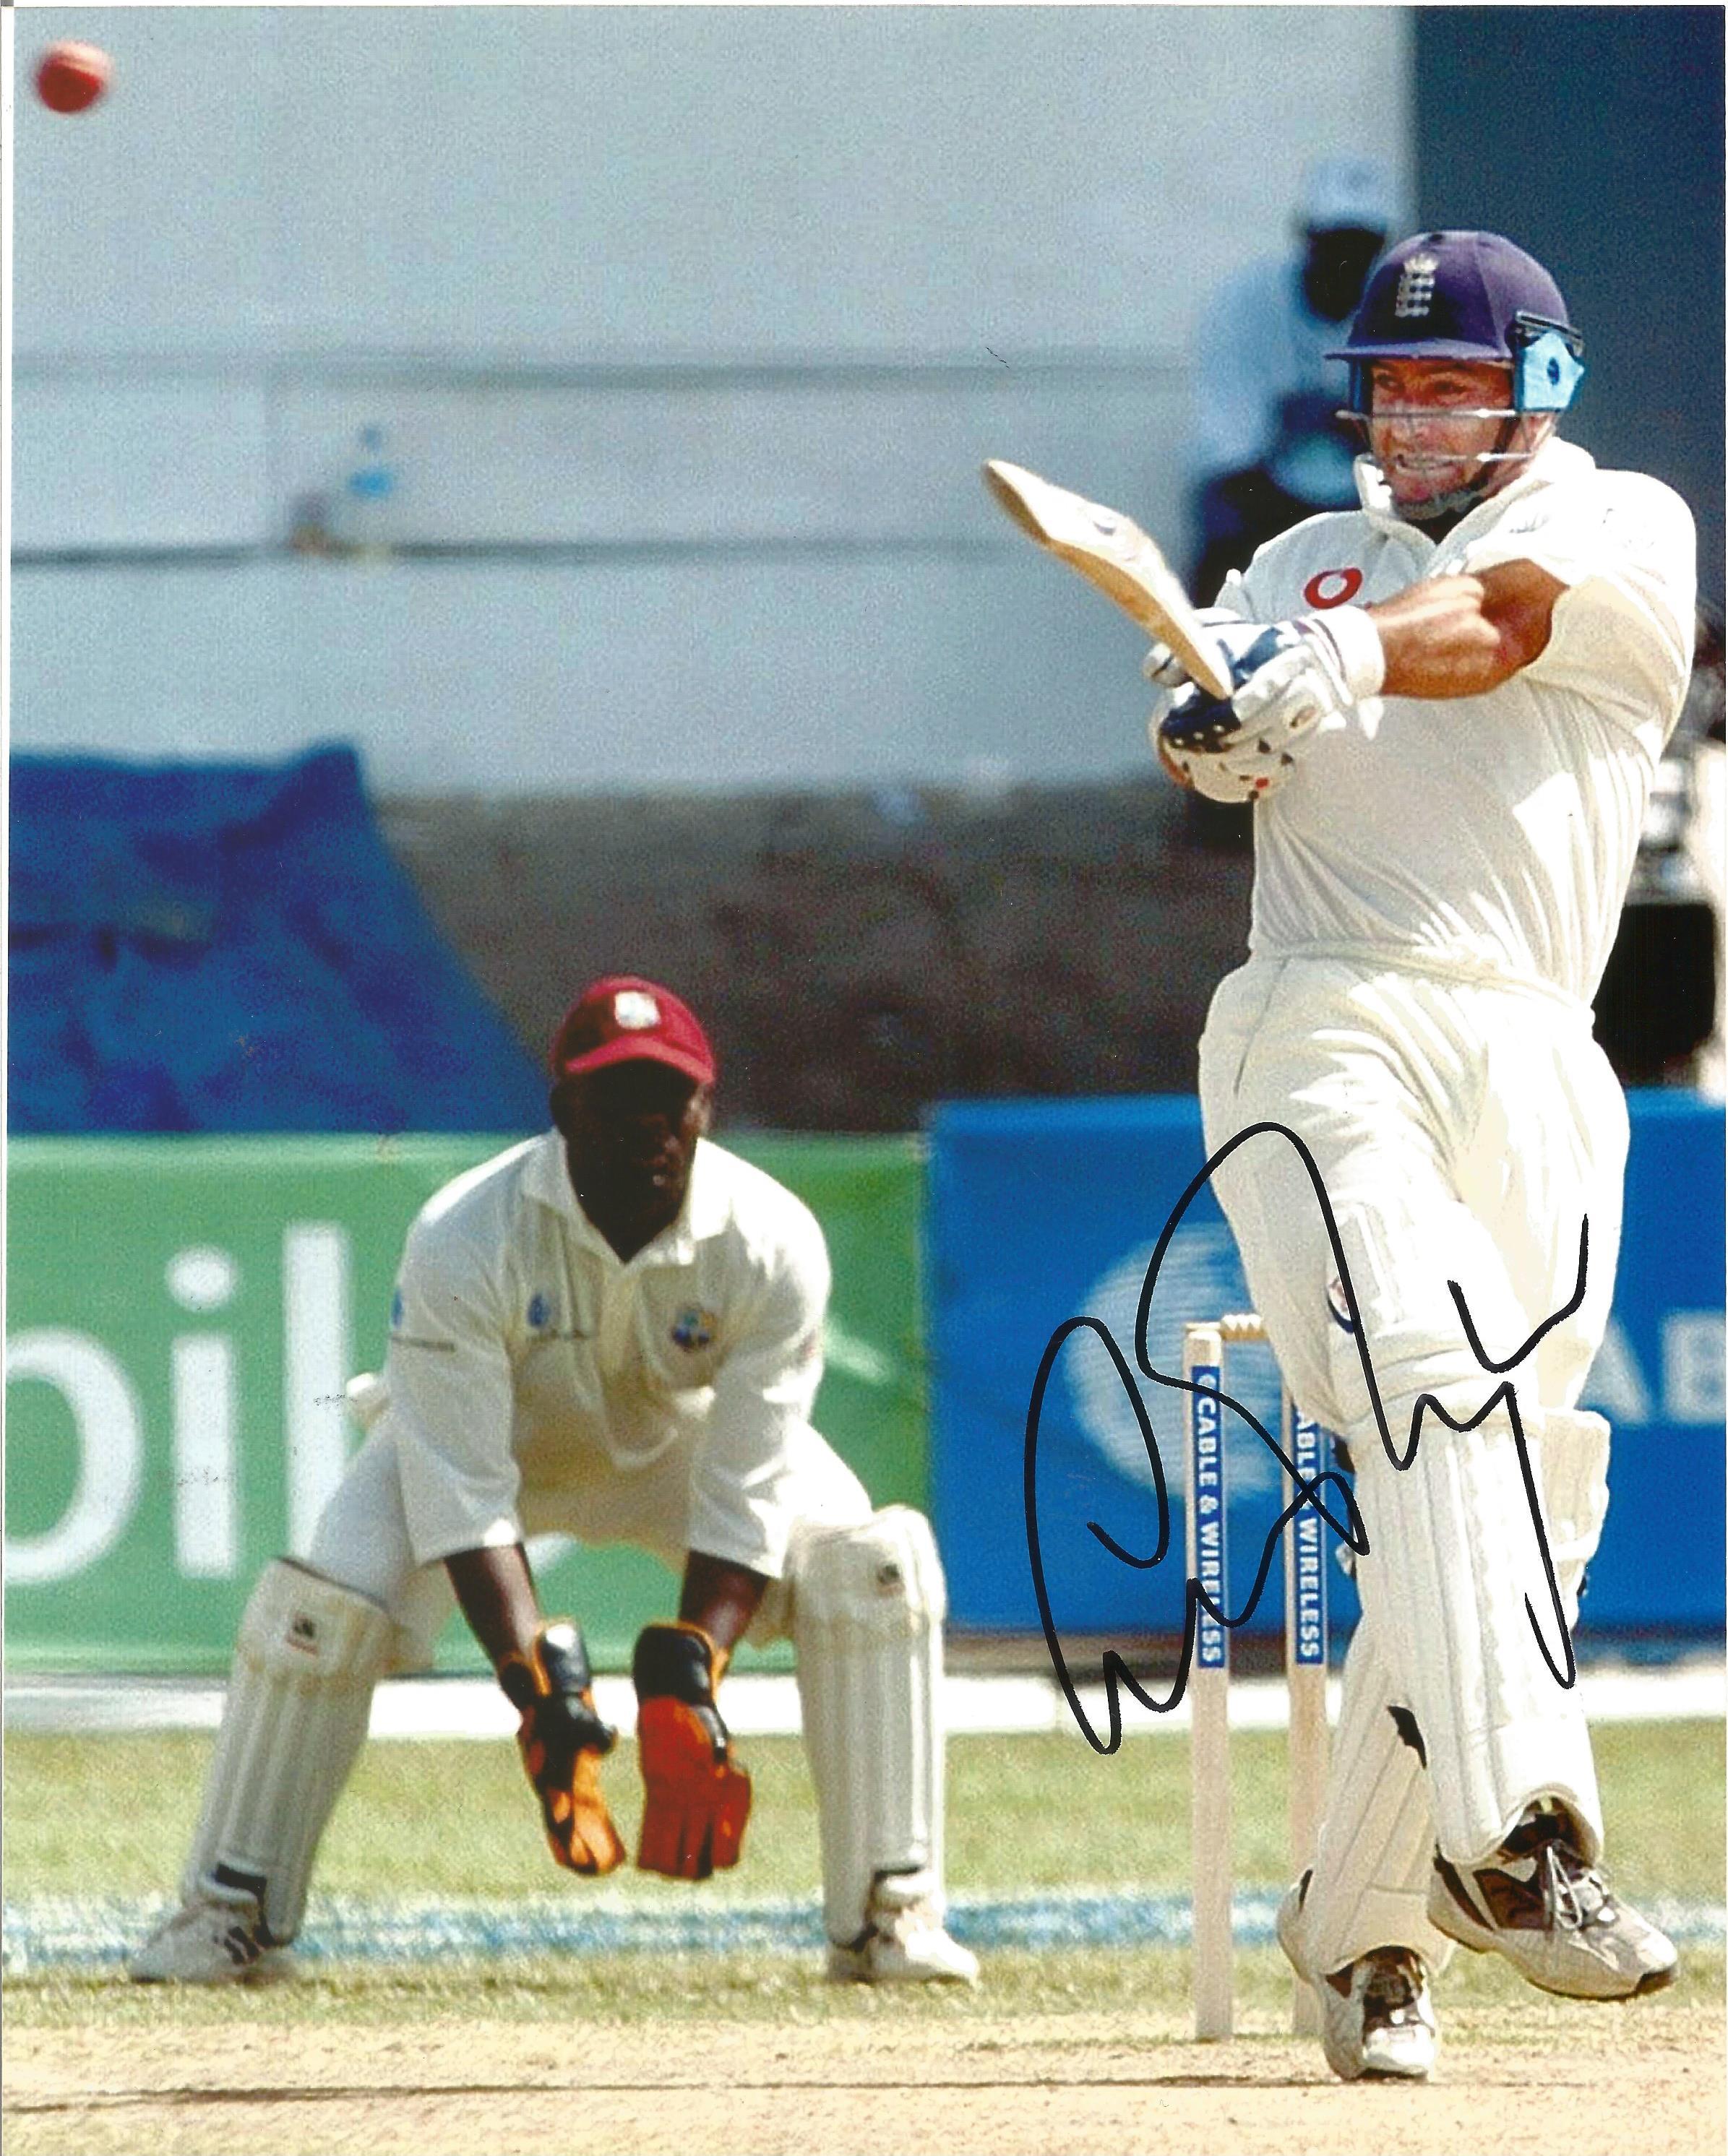 Cricket. Graham Thorpe Signed 10x8 colour photo. Photo shows Thorpe batting for England Against